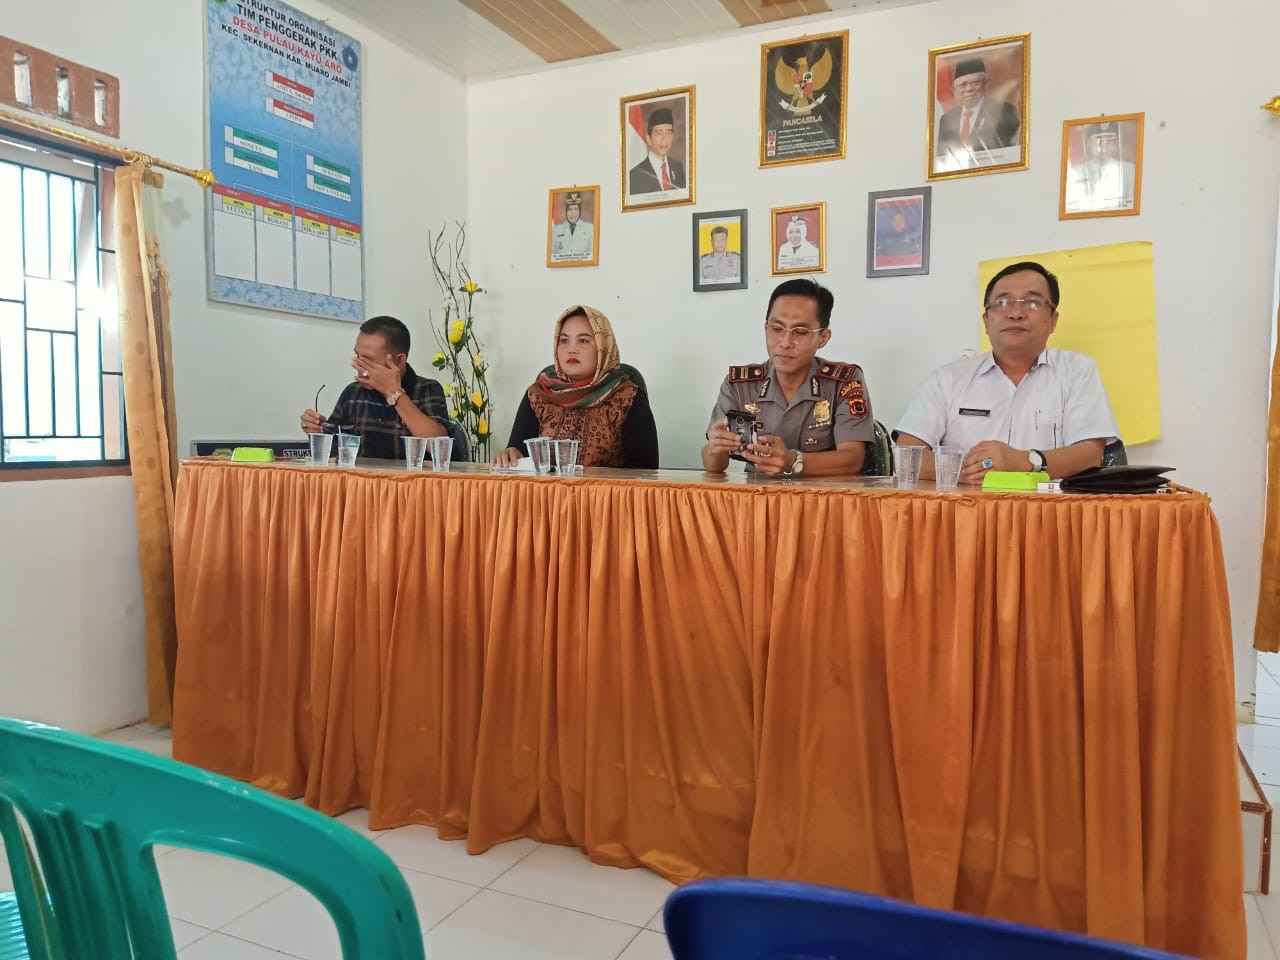 Pertemuan_DLH_Muaro_Jambi_dengan_Masyarakat_Desa_Pulau_Kayu_Aro_Terkait_Penambangan_Pasir.jpg